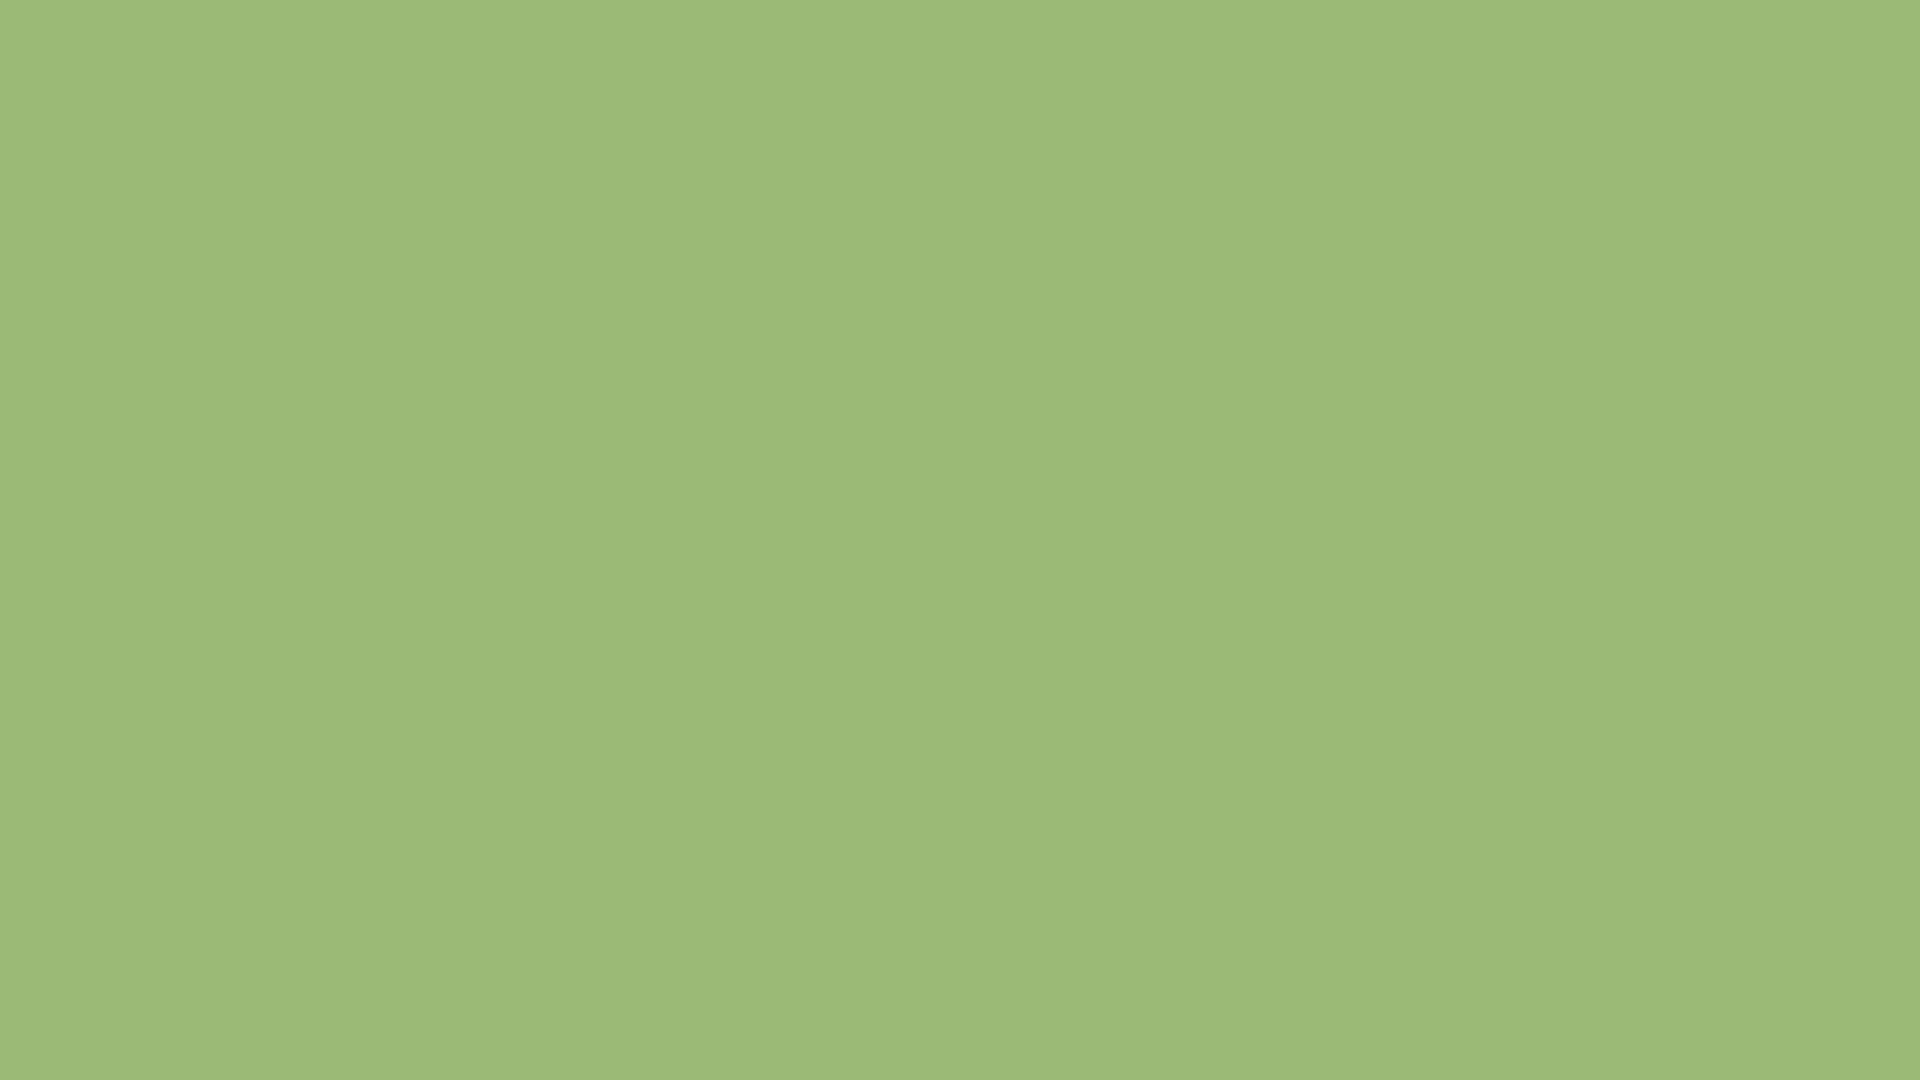 1920x1080 Olivine Solid Color Background